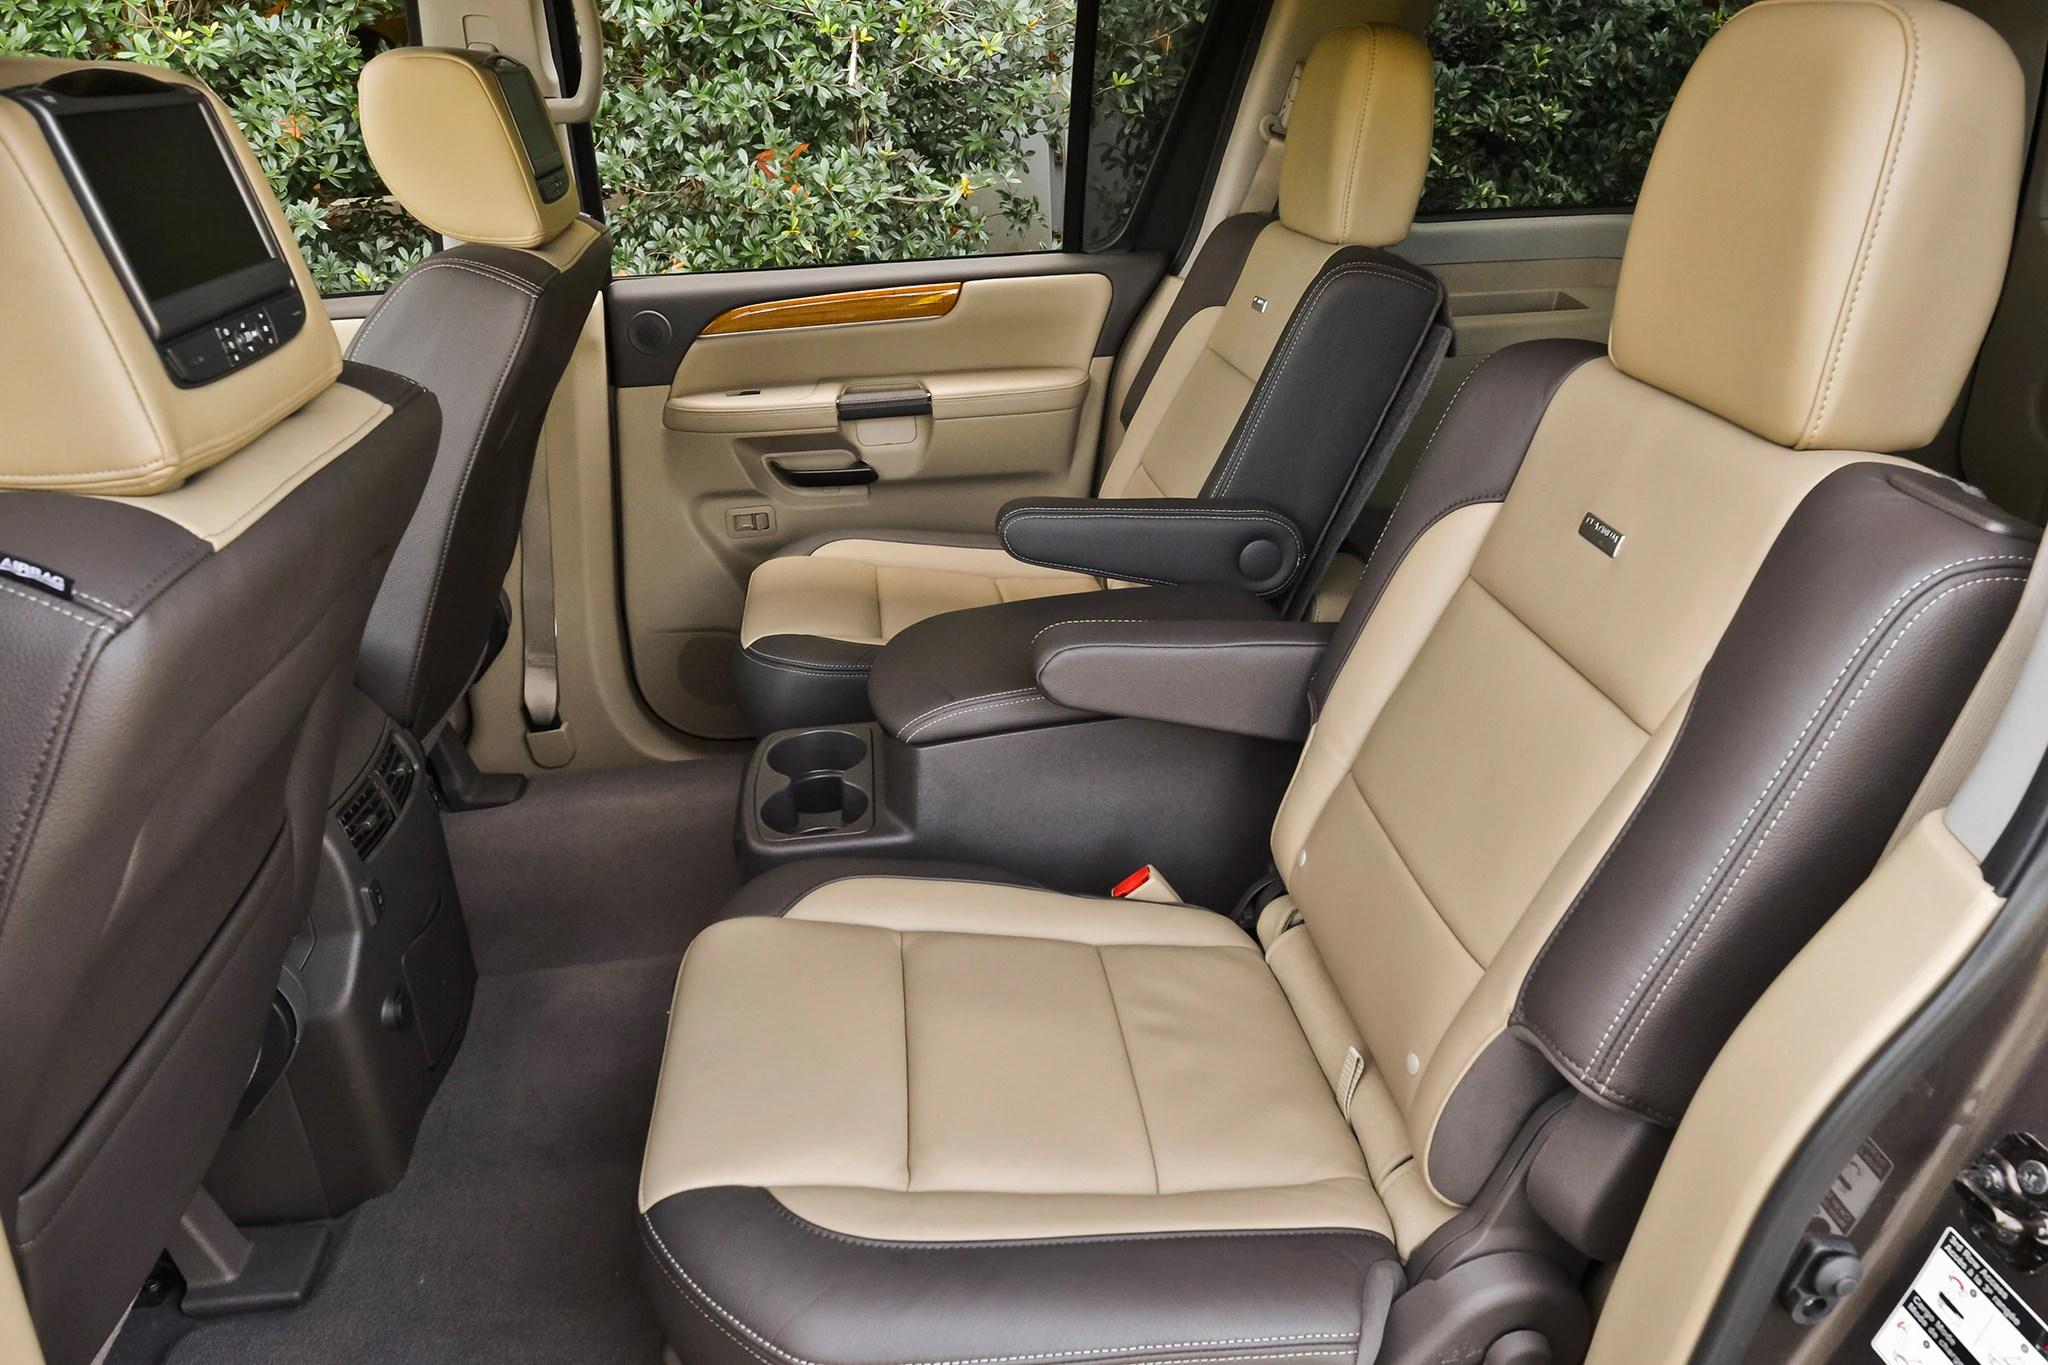 2015 Nissan Armada Base Price Rises Slightly to 39055